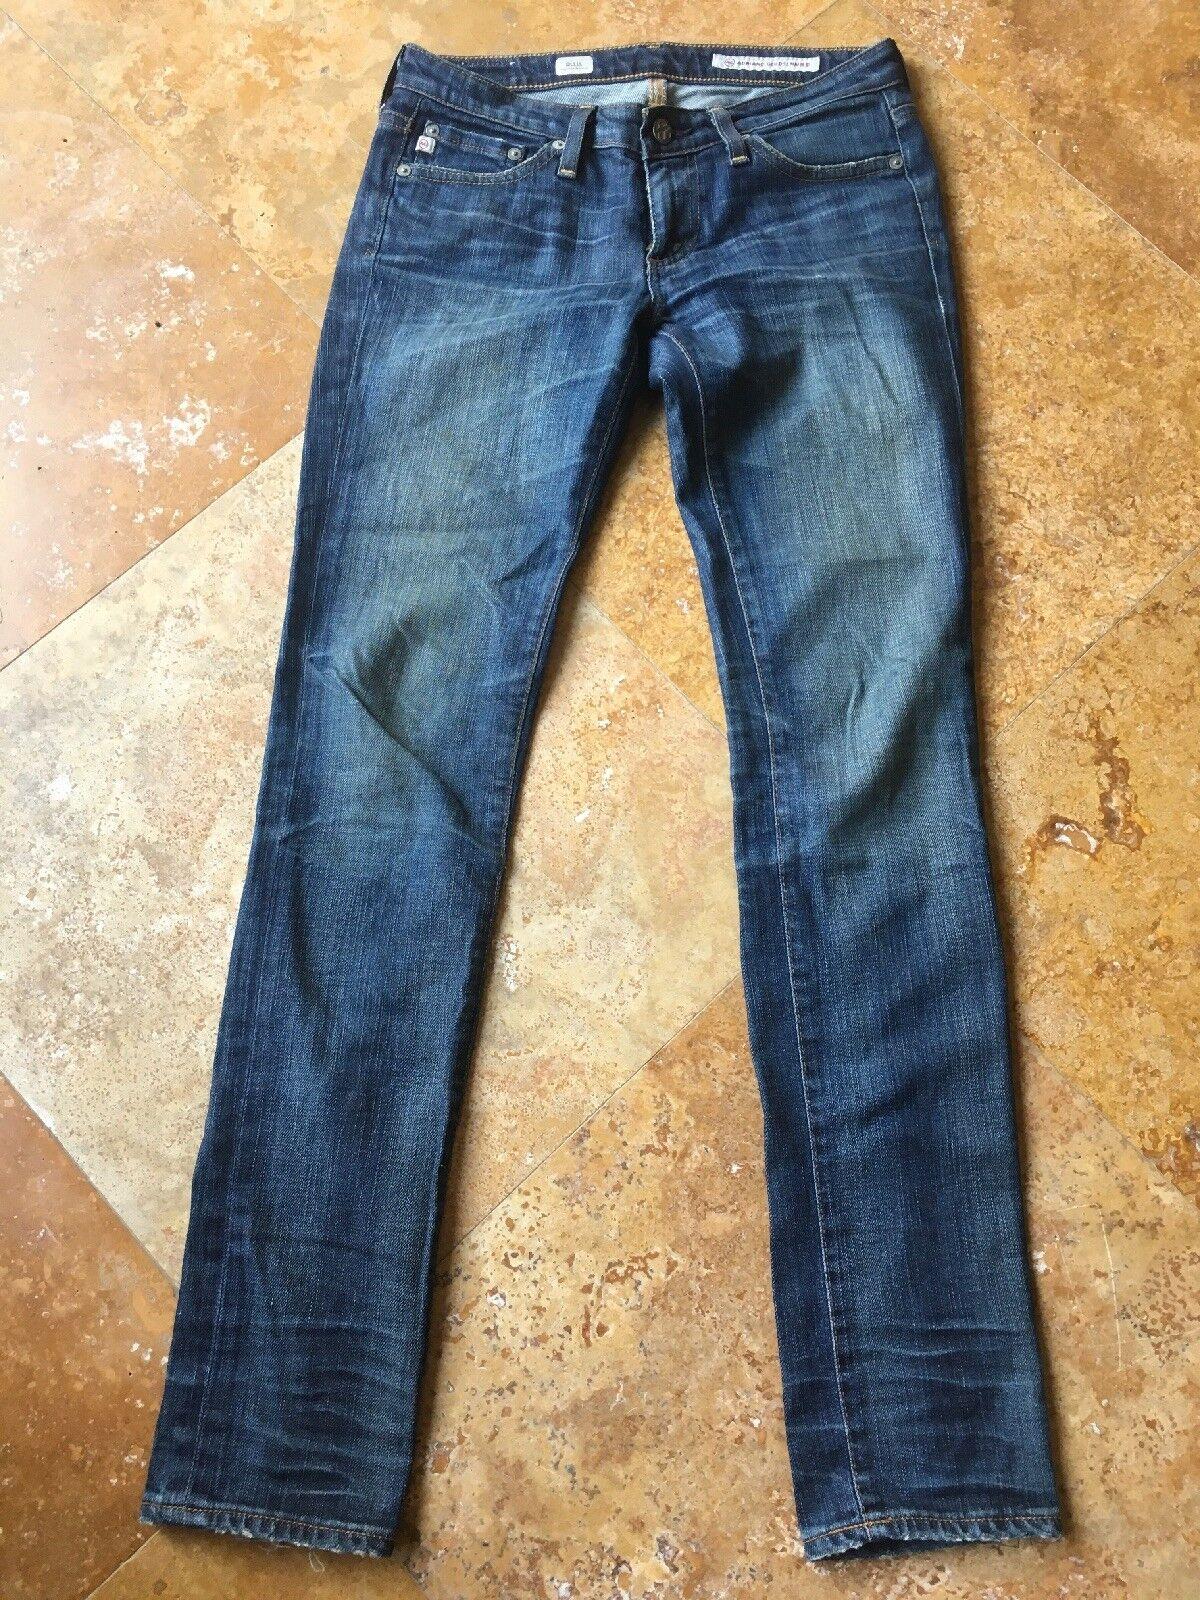 Adriano goldschmied The Stilt Cigarette Leg Stretch Jeans, Medium Wash, 24 R